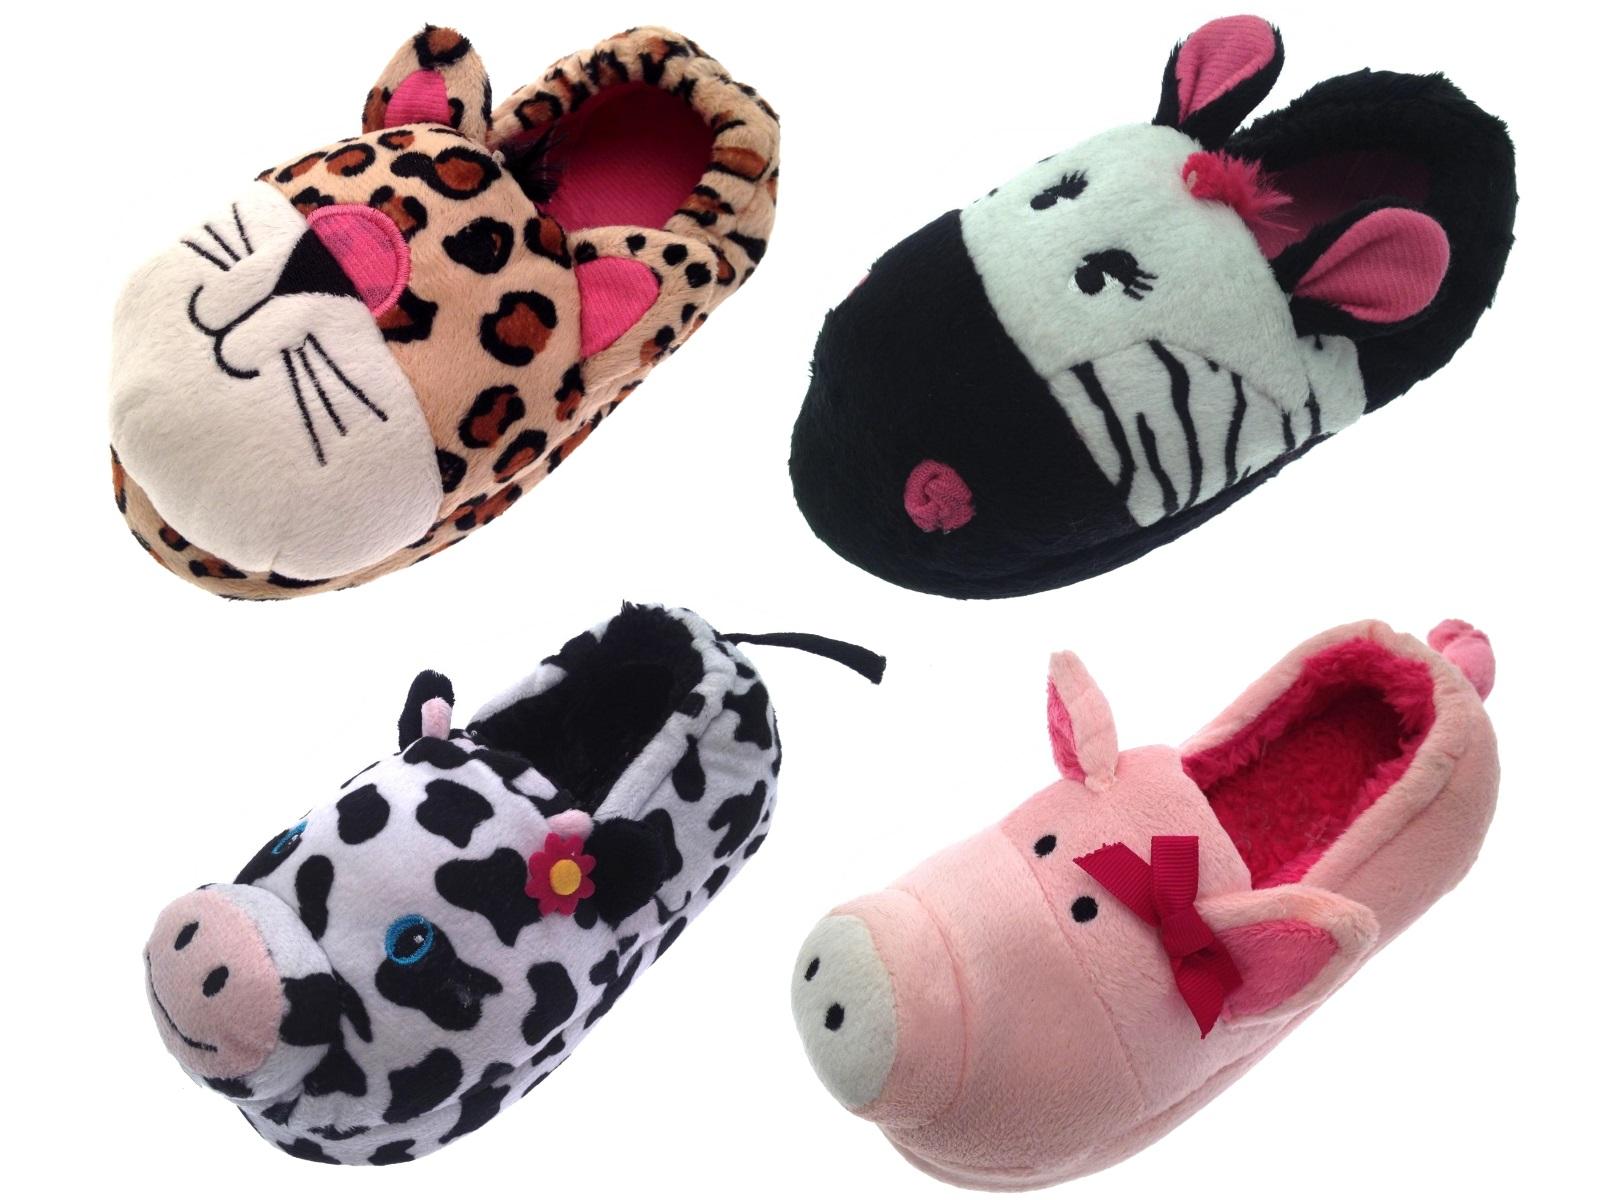 78ace2cc4308 Kids Girls 3D Novelty Slipper Boots Booties Plush Animal Slippers Size UK 9  - 3